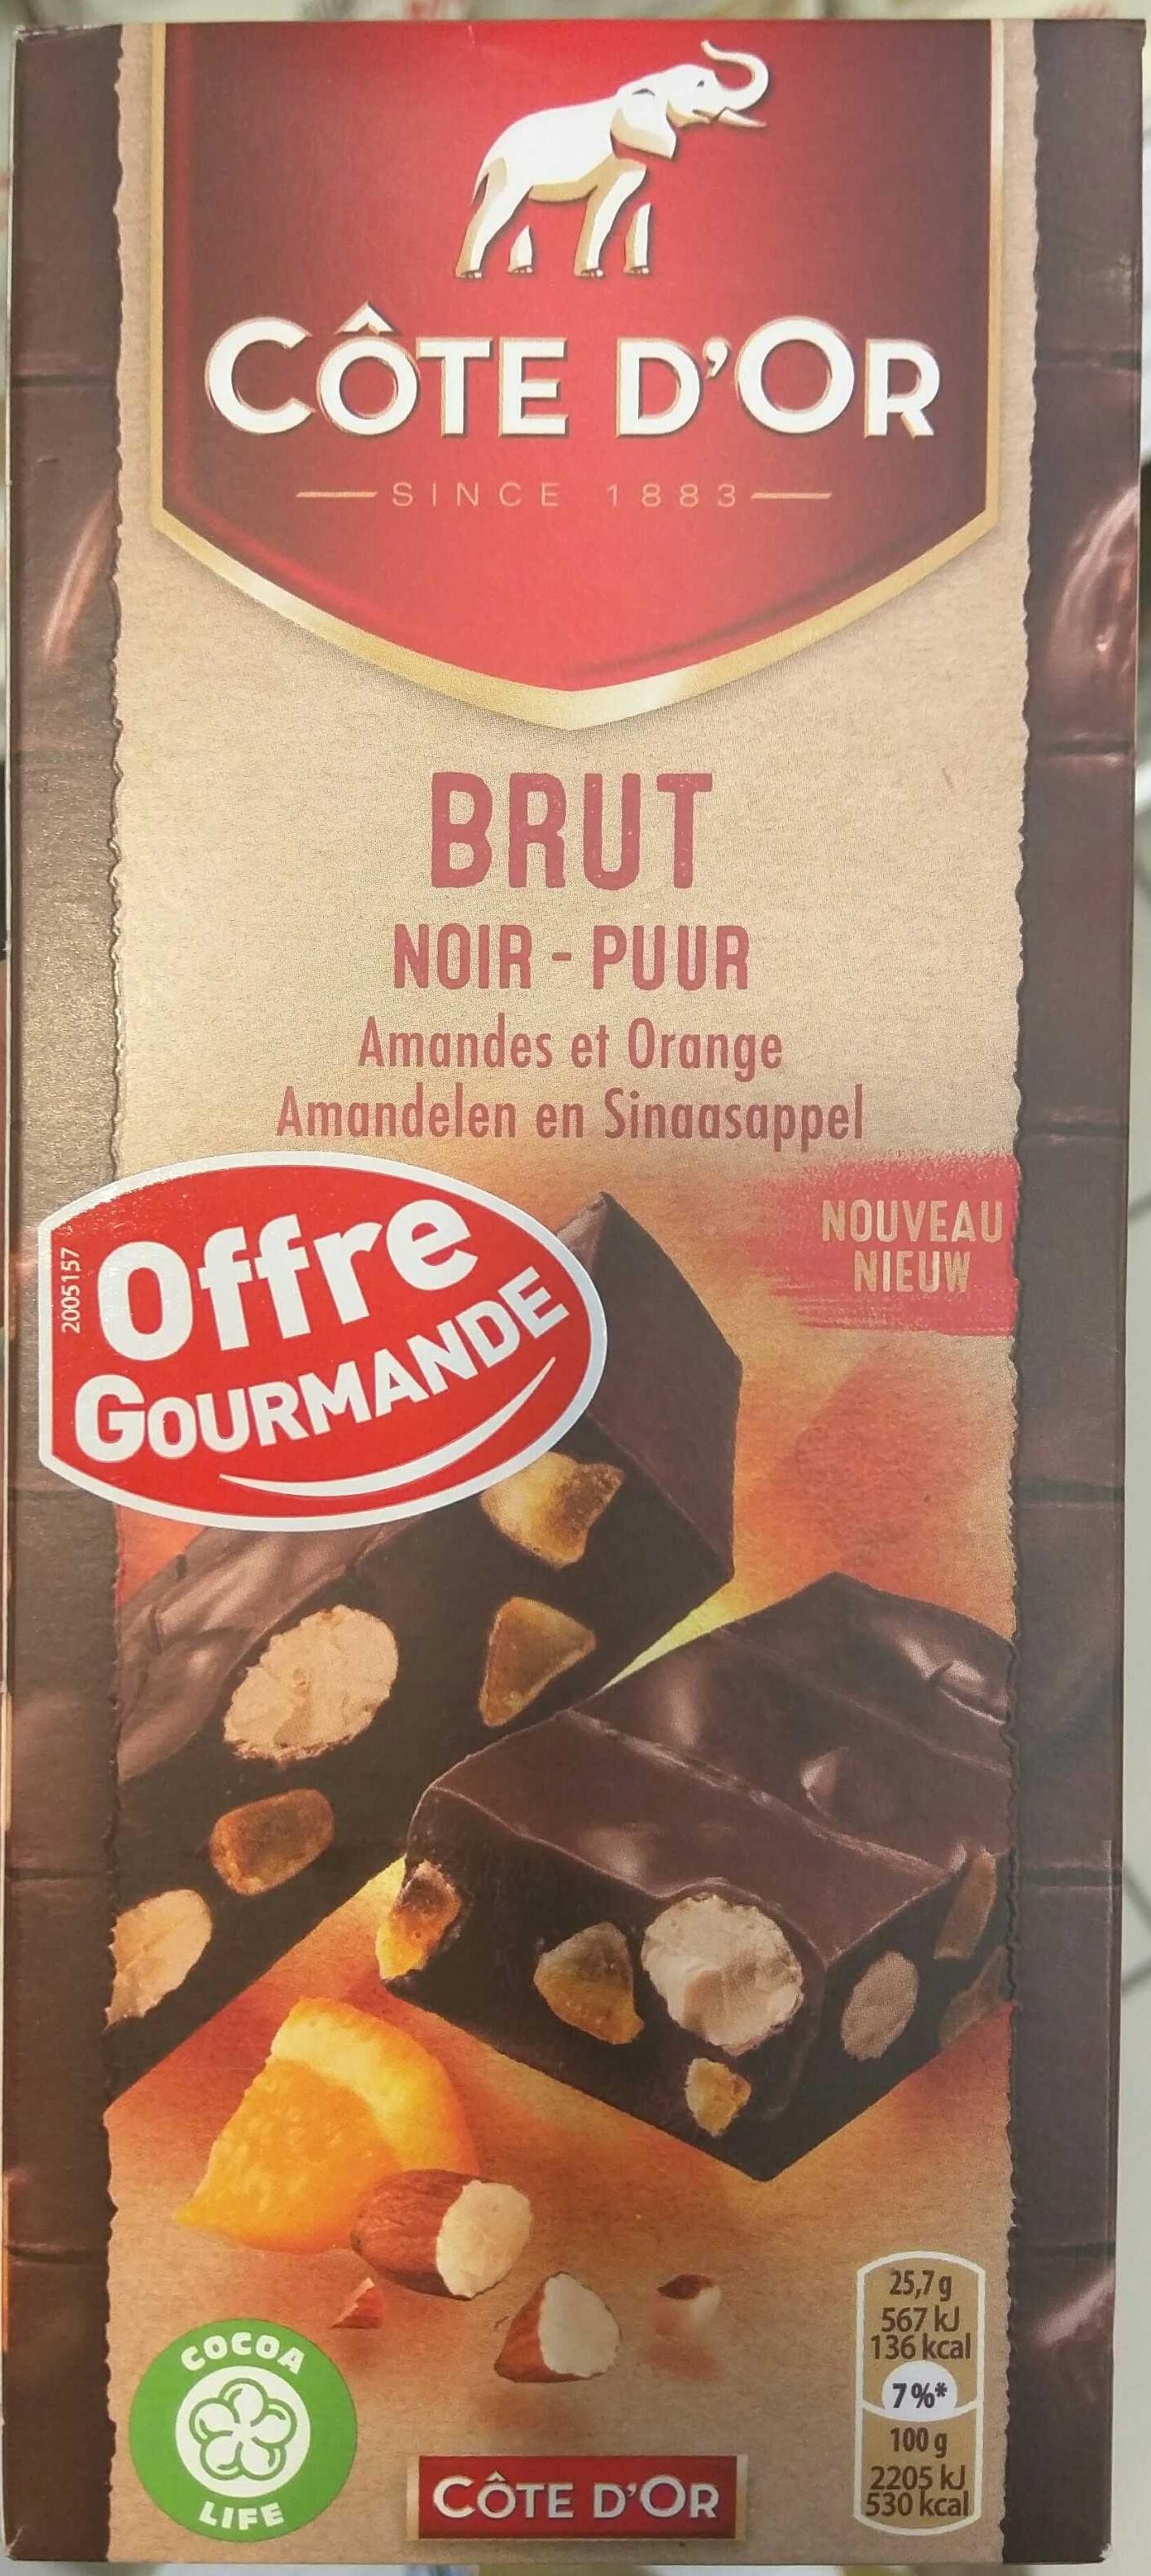 Brut Noir Amandes et Orange - Product - fr